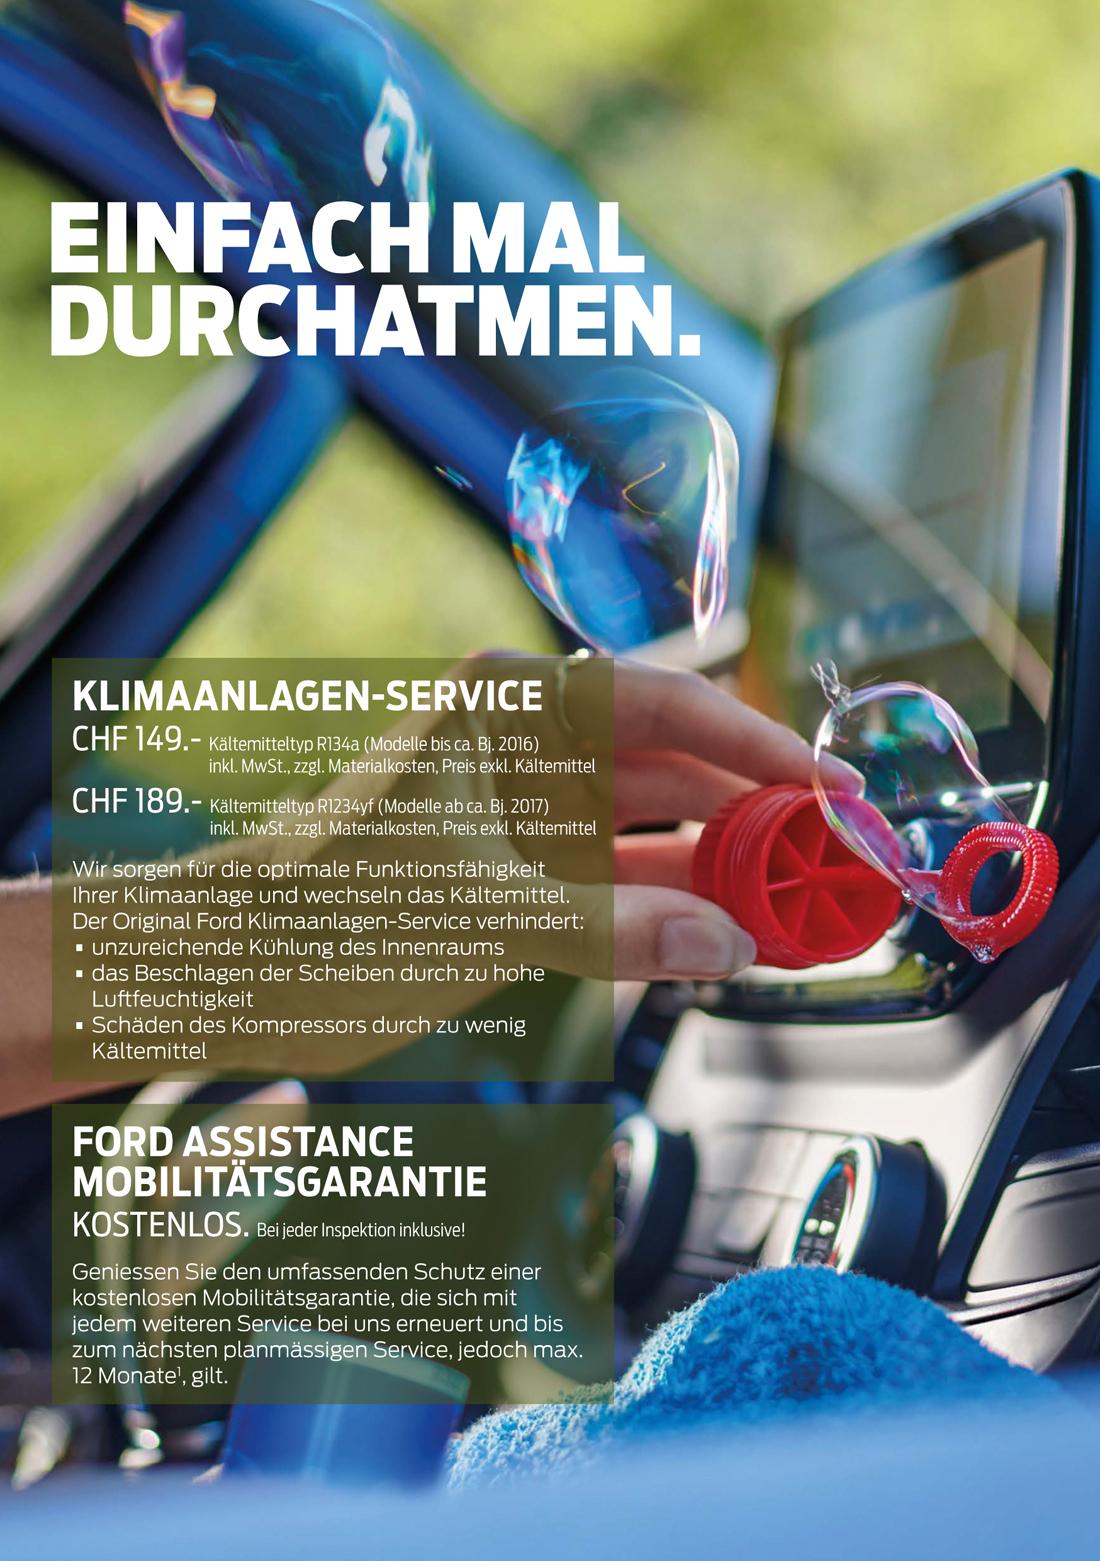 2021-Ford_Fruehlingskampagne_Broschuere-Seite-2a-2021-03-02.jpg#asset:718